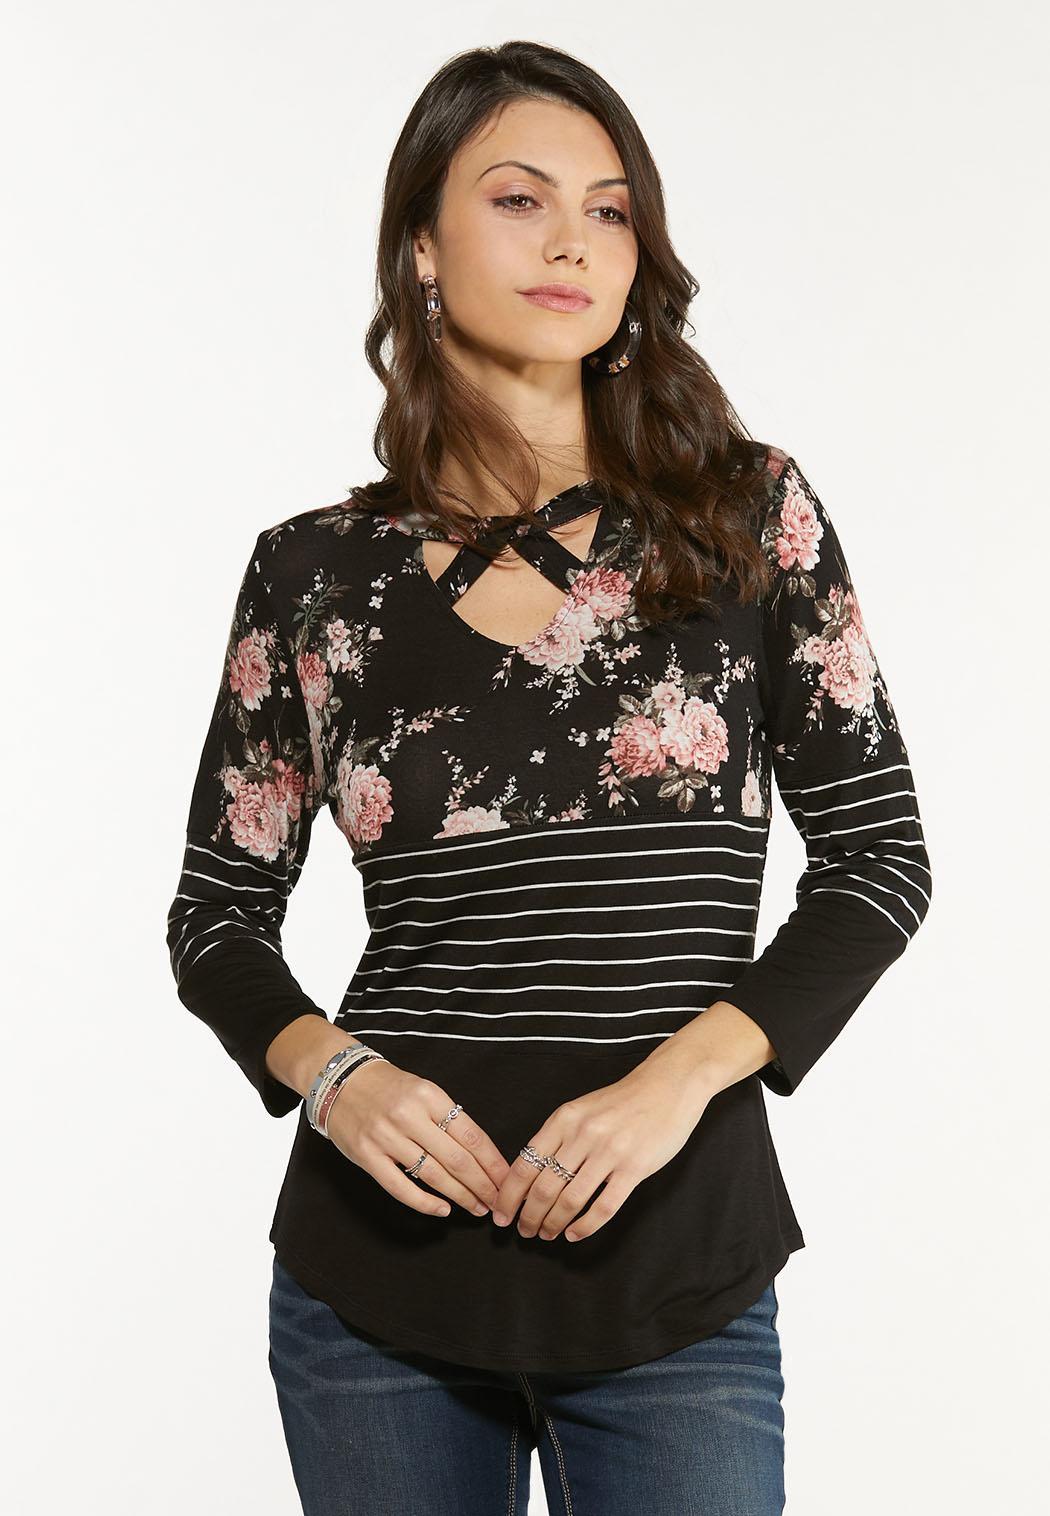 Plus Size Criss Cross Striped Floral Top